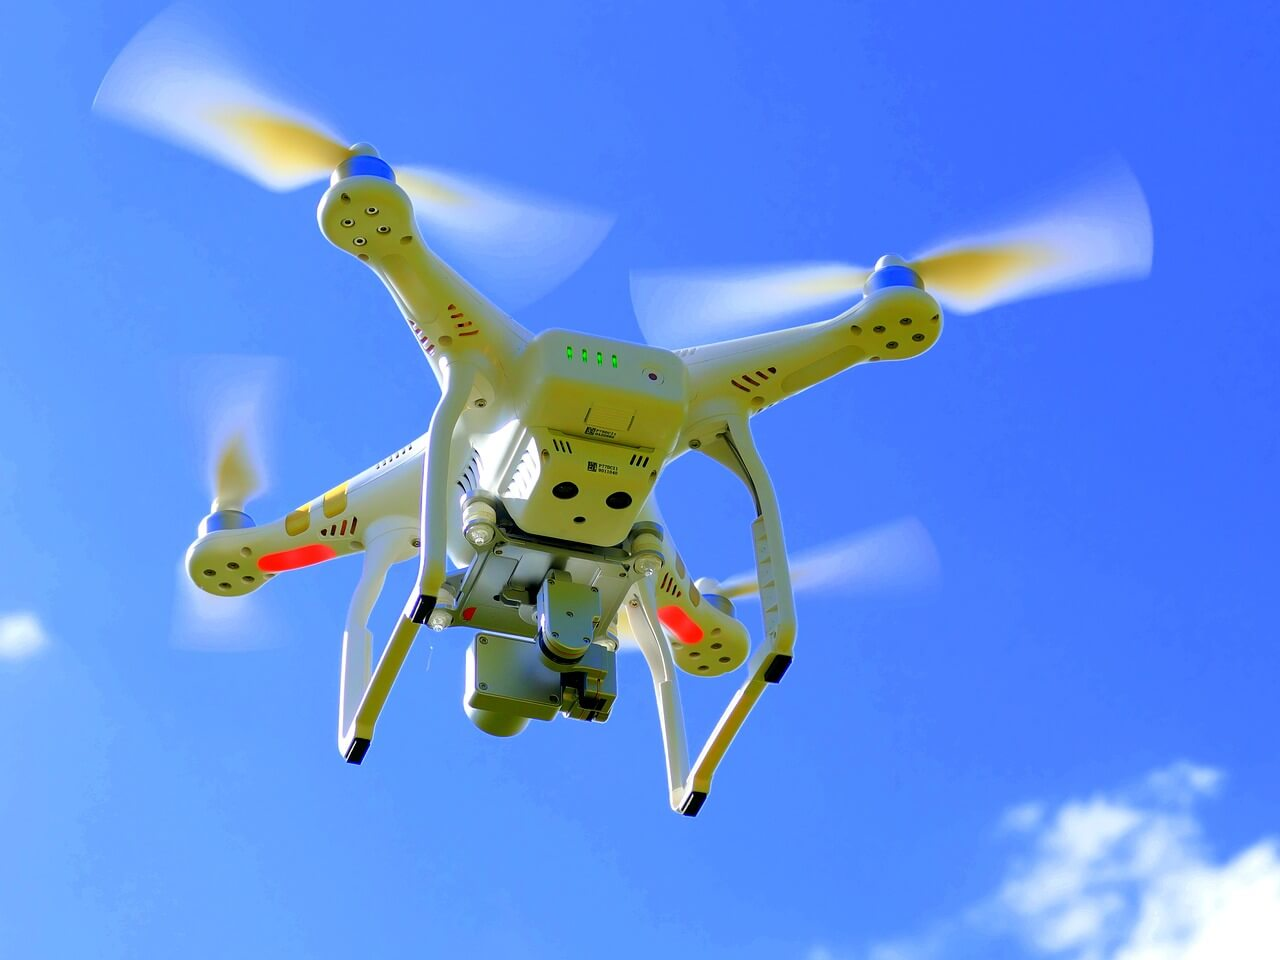 Dron volando